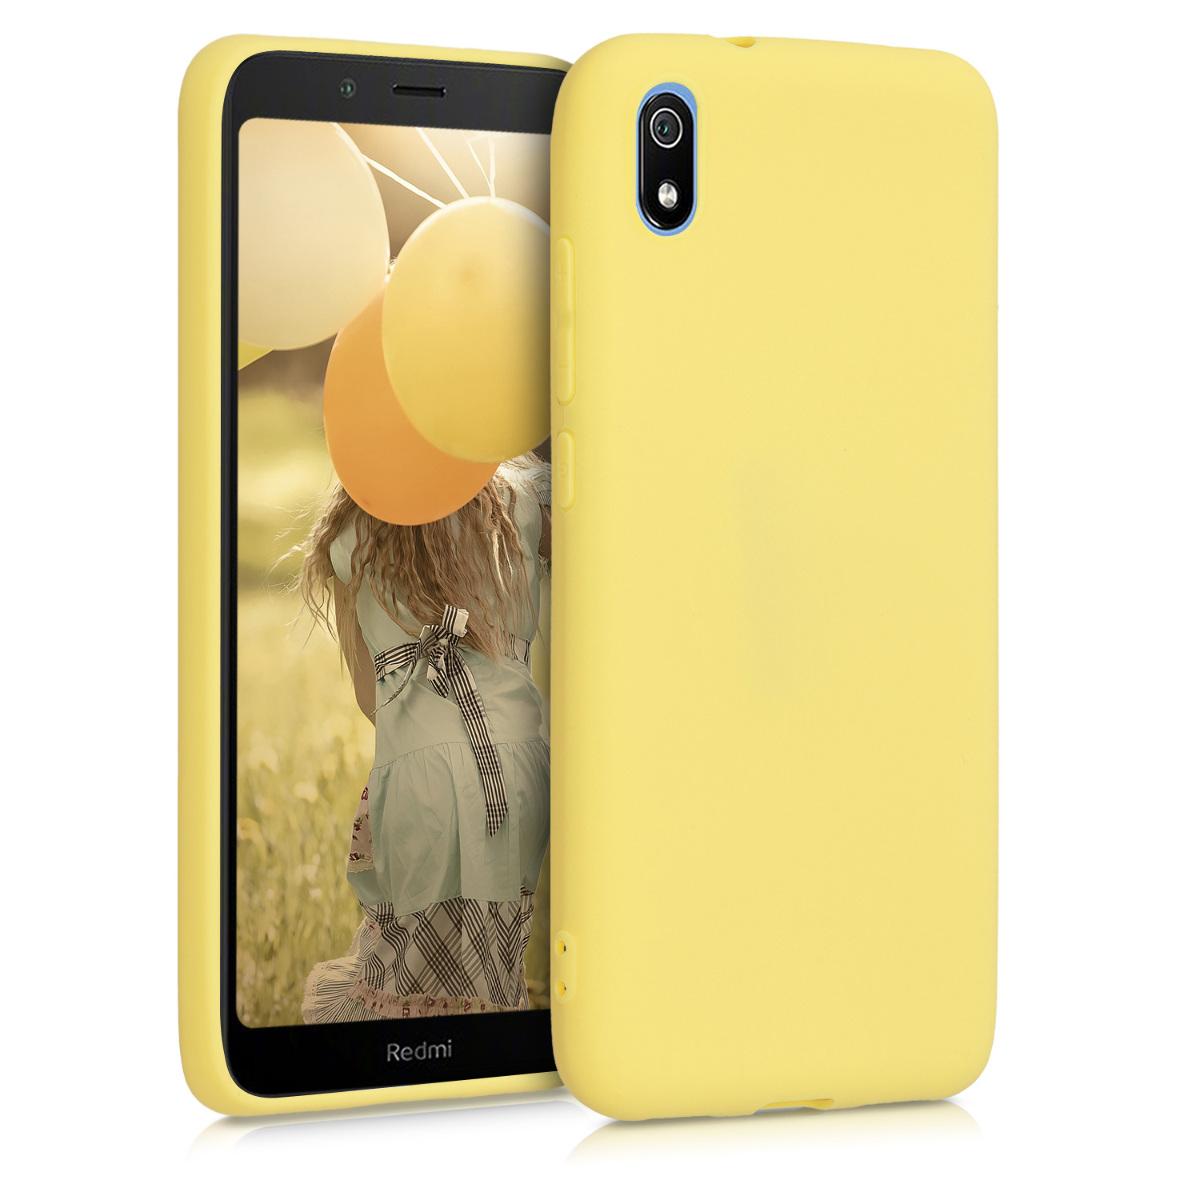 KW Θήκη Σιλικόνης Xiaomi Redmi 7A - Soft Flexible Shock Absorbent - Yellow Matte (49231.49)